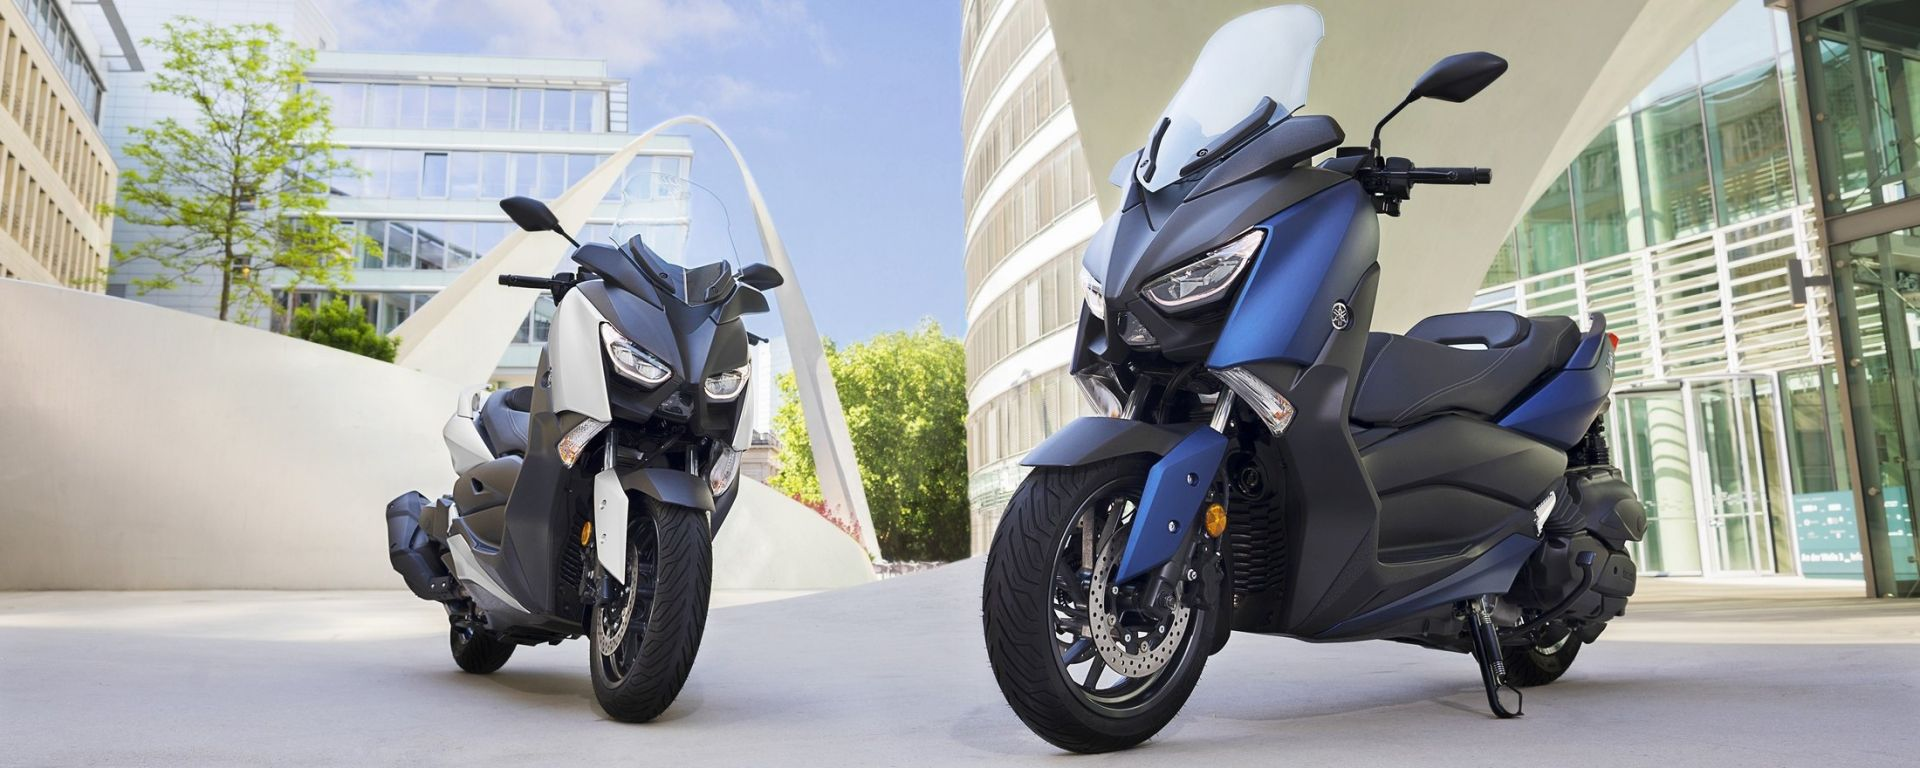 Nuovo Yamaha T-Max 400 2018